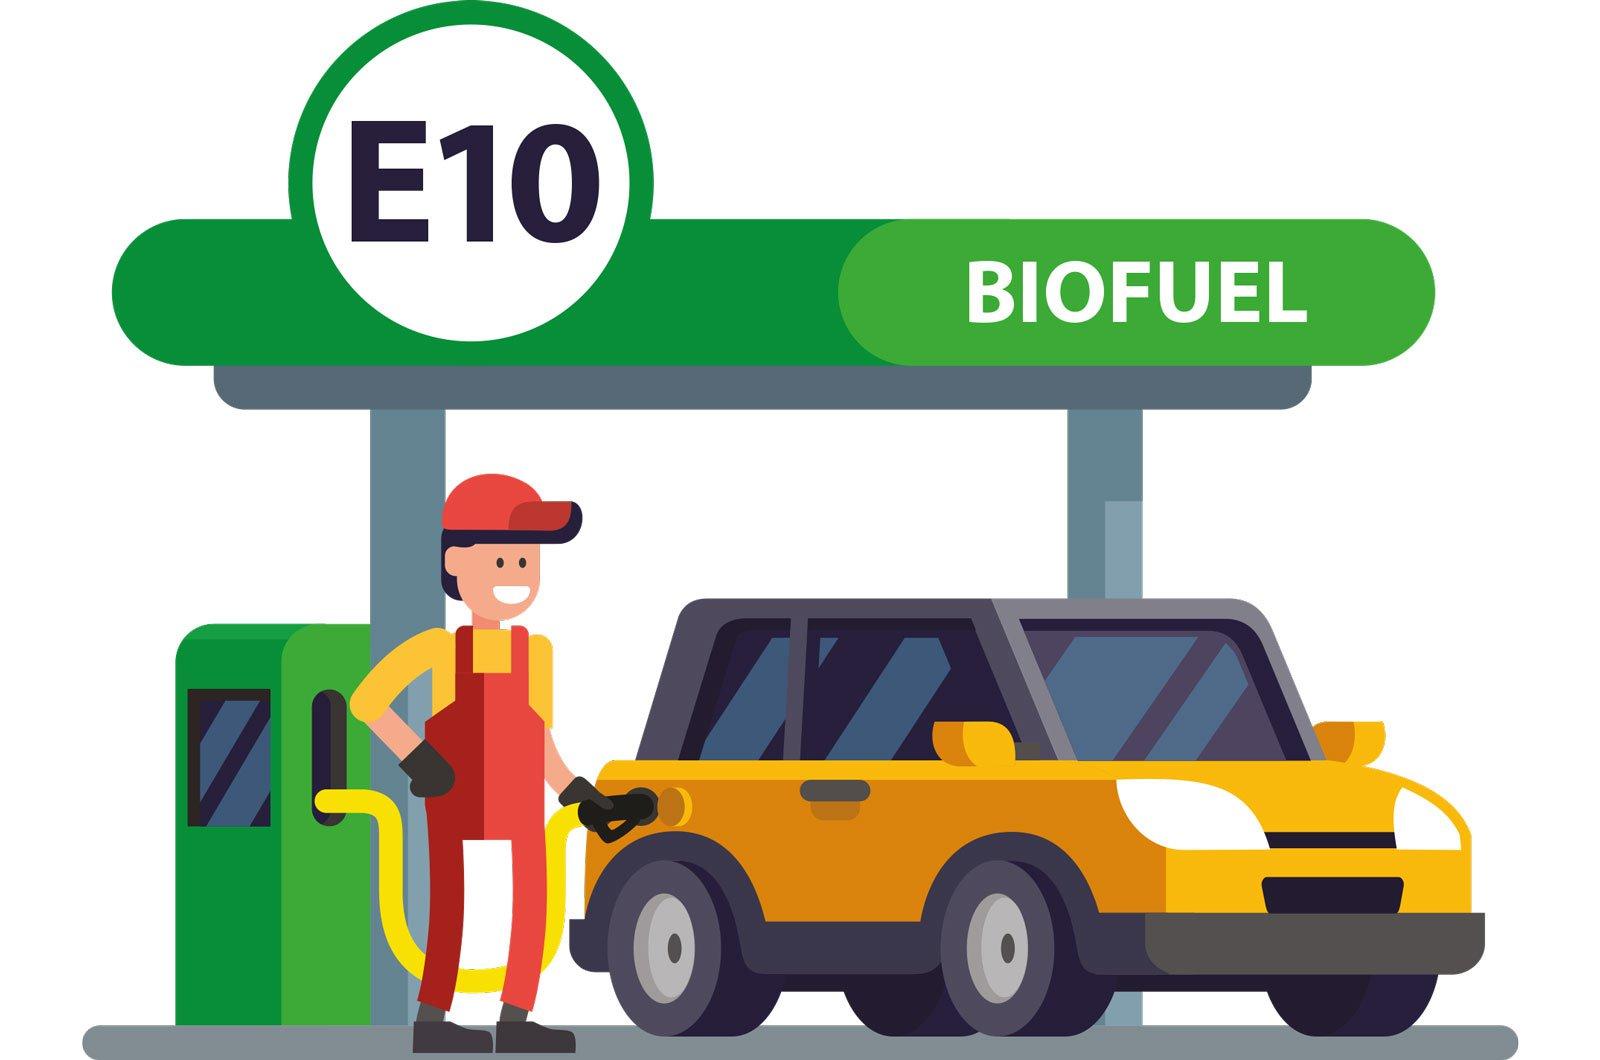 E10 biofuel main image